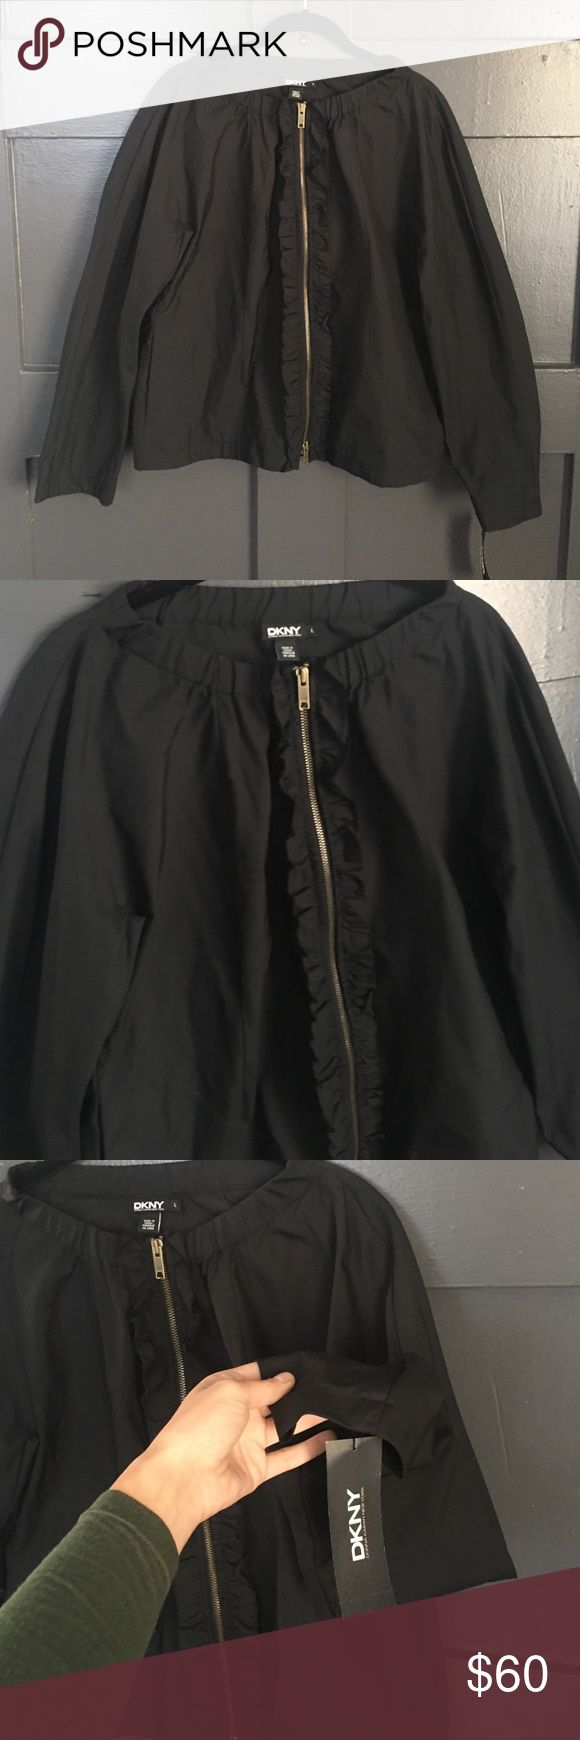 NWT DONNA KARAN COTTON JACKET Cape like shape. Cotton with water proof coat. Size L zip up DKNY Jackets & Coats